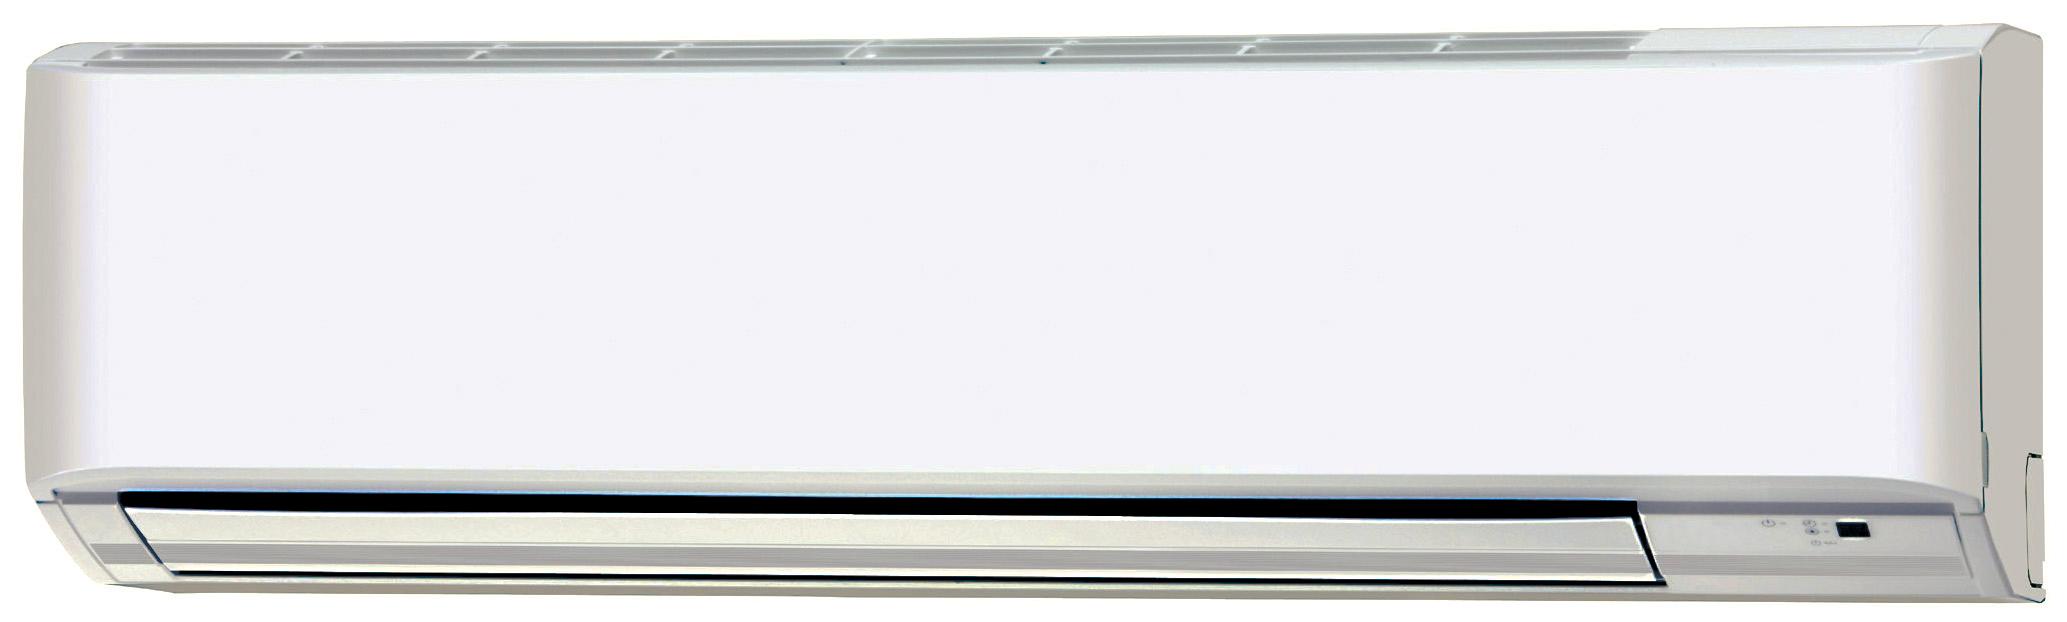 Climaveneta W3000 interface Manual